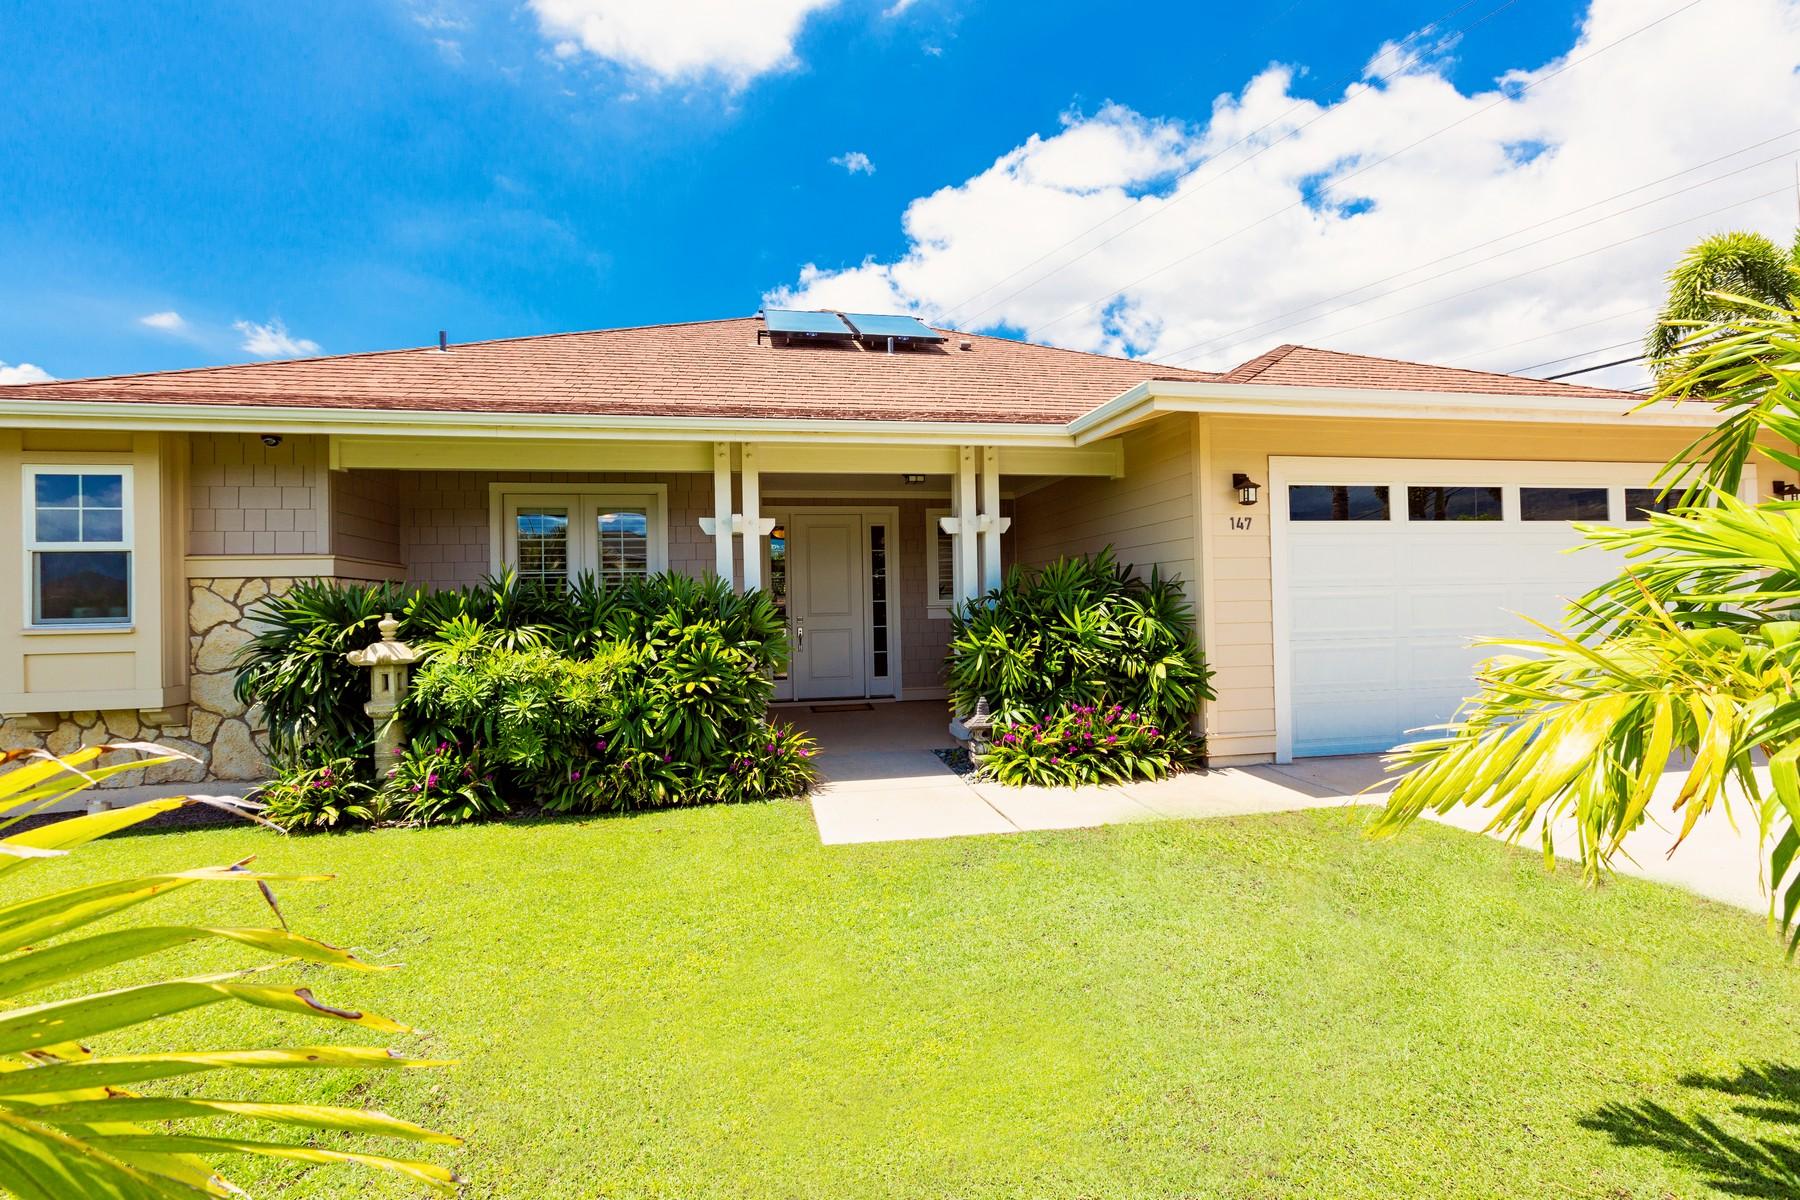 Single Family Homes για την Πώληση στο Gorgeous Moana Estates Model-like Residence 147 Moana Ave, Kihei, Χαβαη 96753 Ηνωμένες Πολιτείες